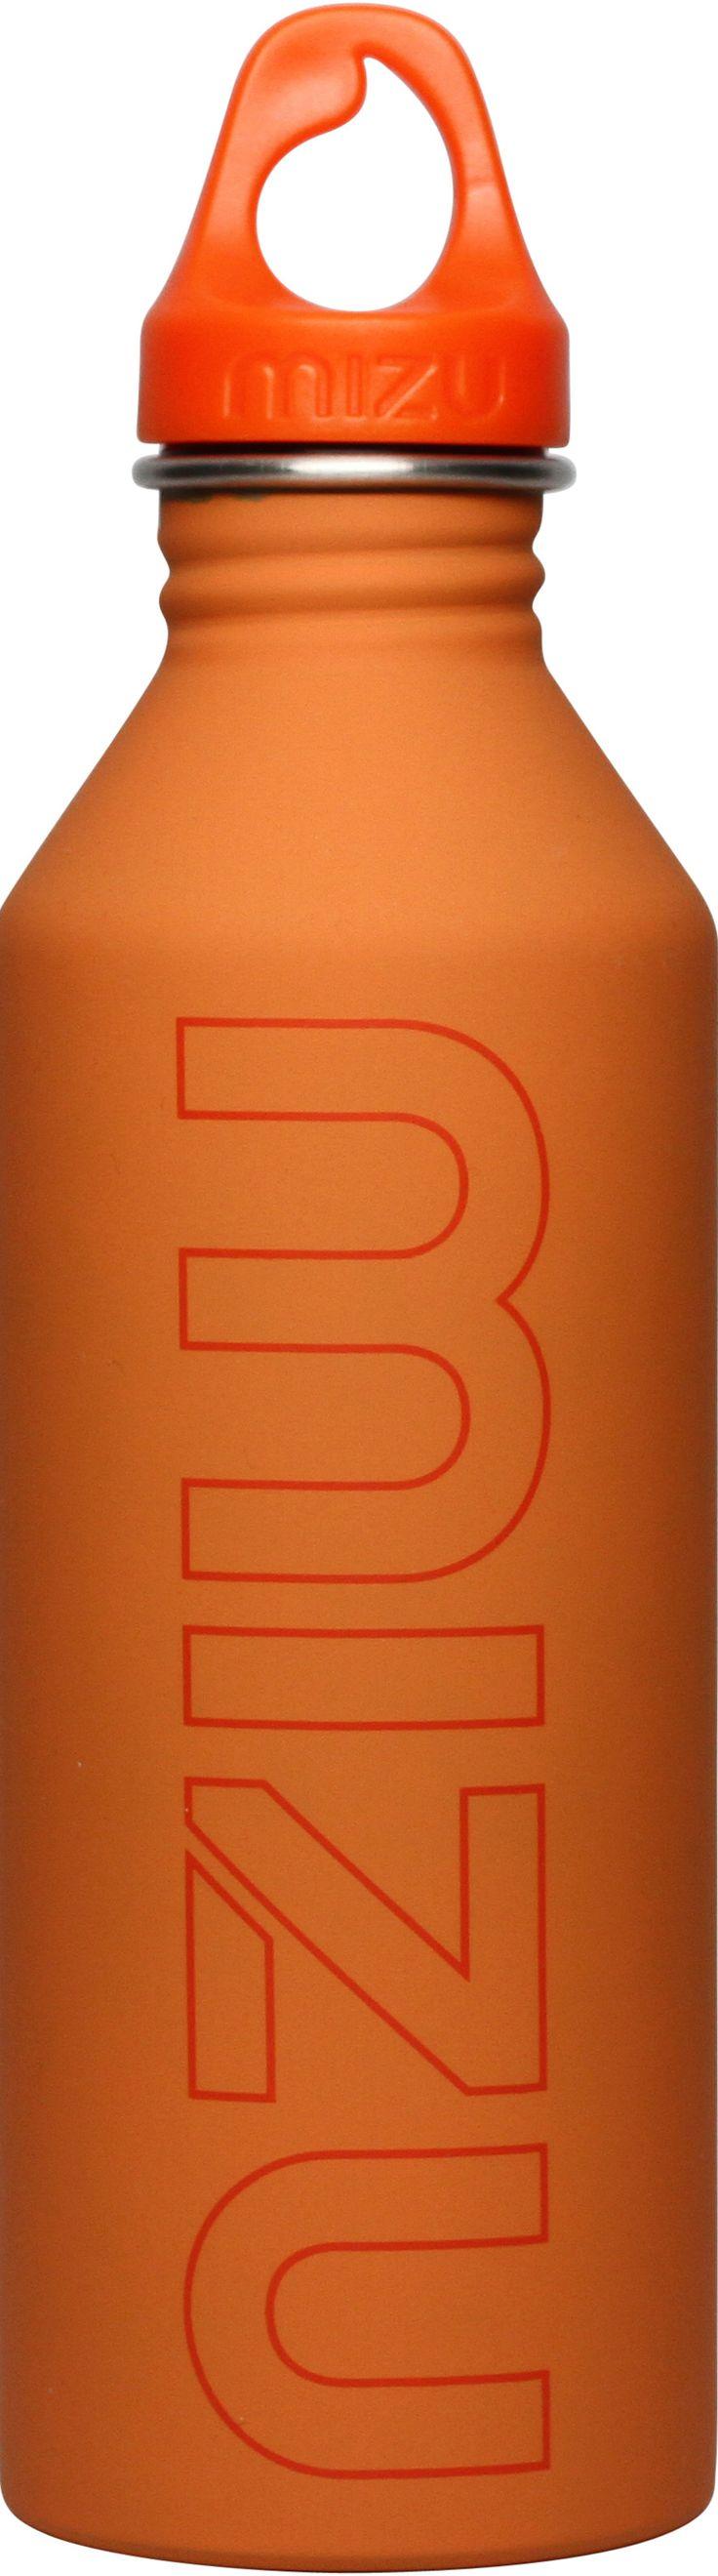 Mizu bottle orange